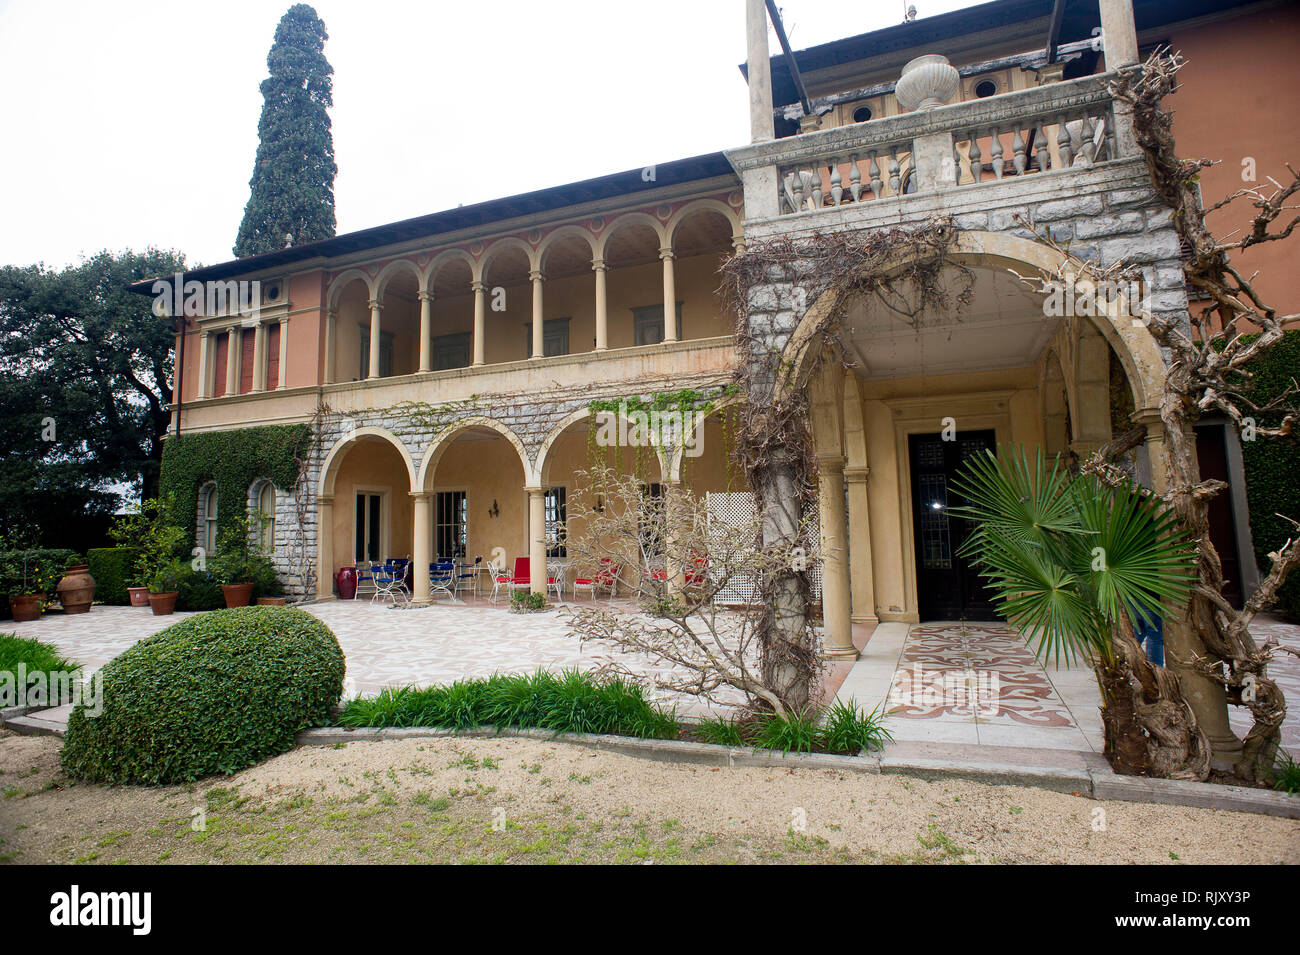 Italy, Lombardy, Sulzano (BS) Lago d'Iseo, island of S, Paolo, Pietro Beretta,  in the garden  of Villa S. Paolo - Stock Image